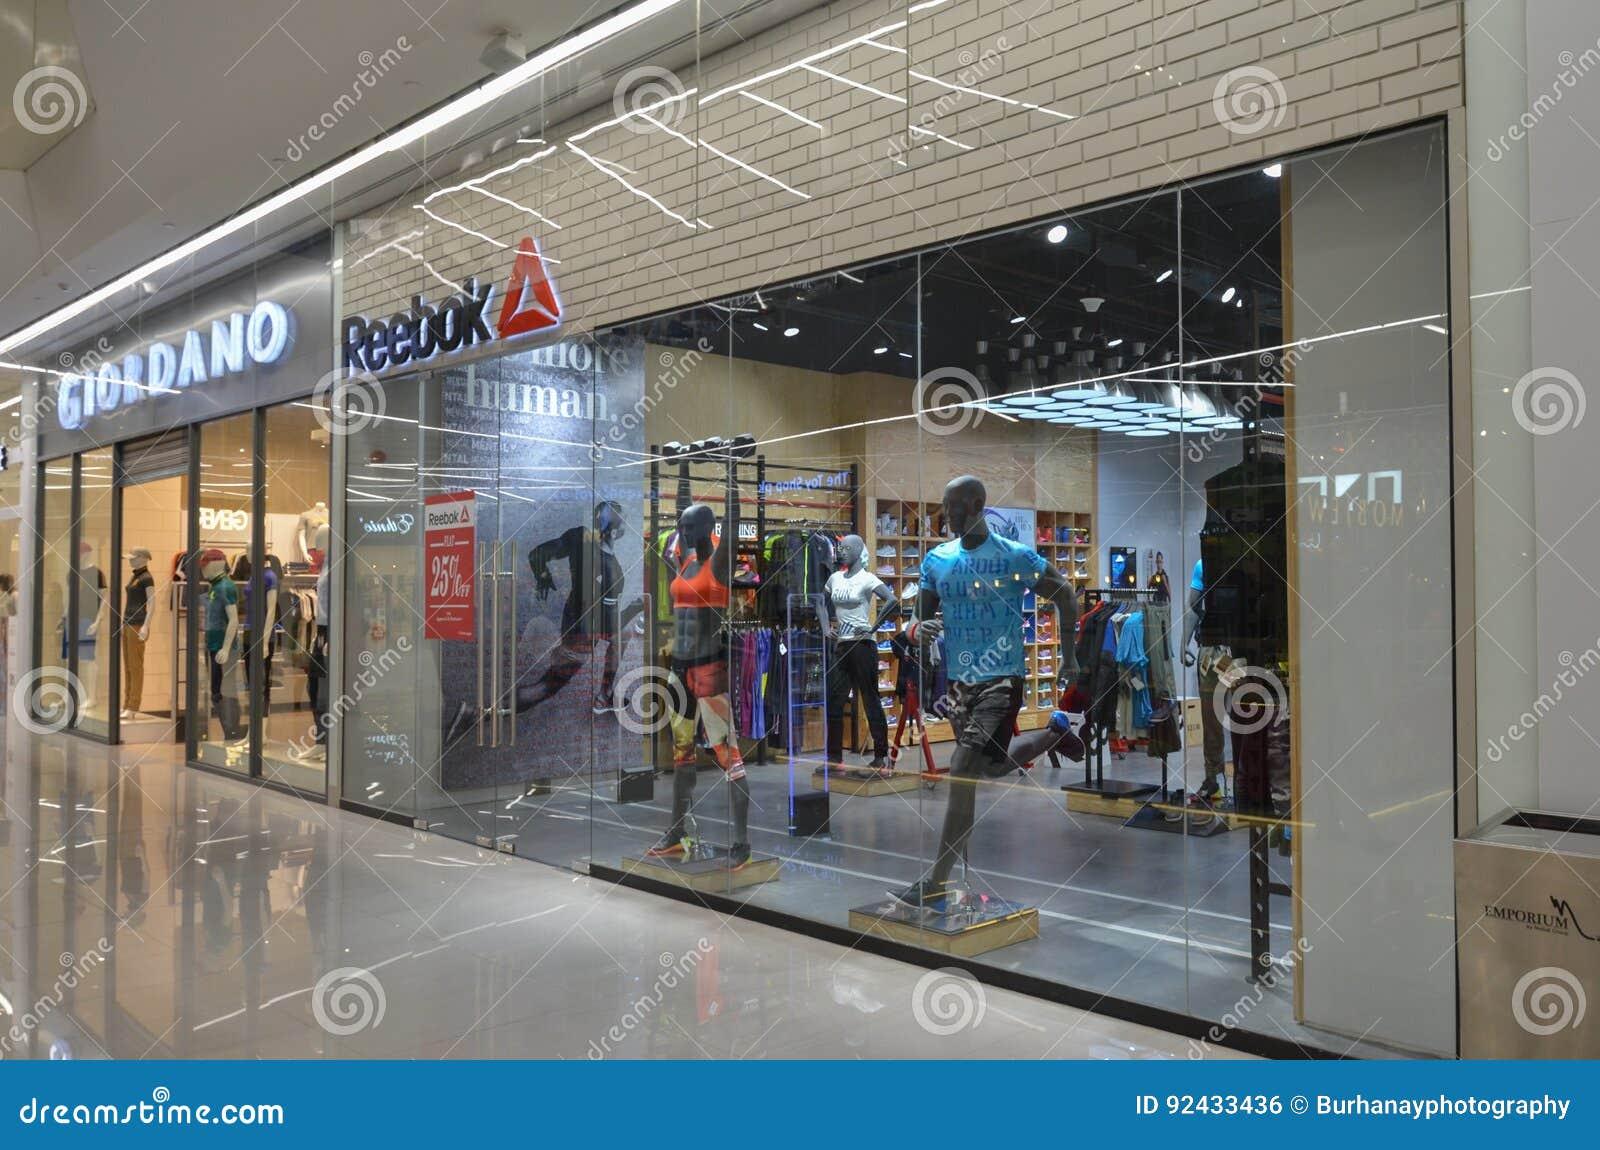 dd8a4beb058 reebok outlet mall